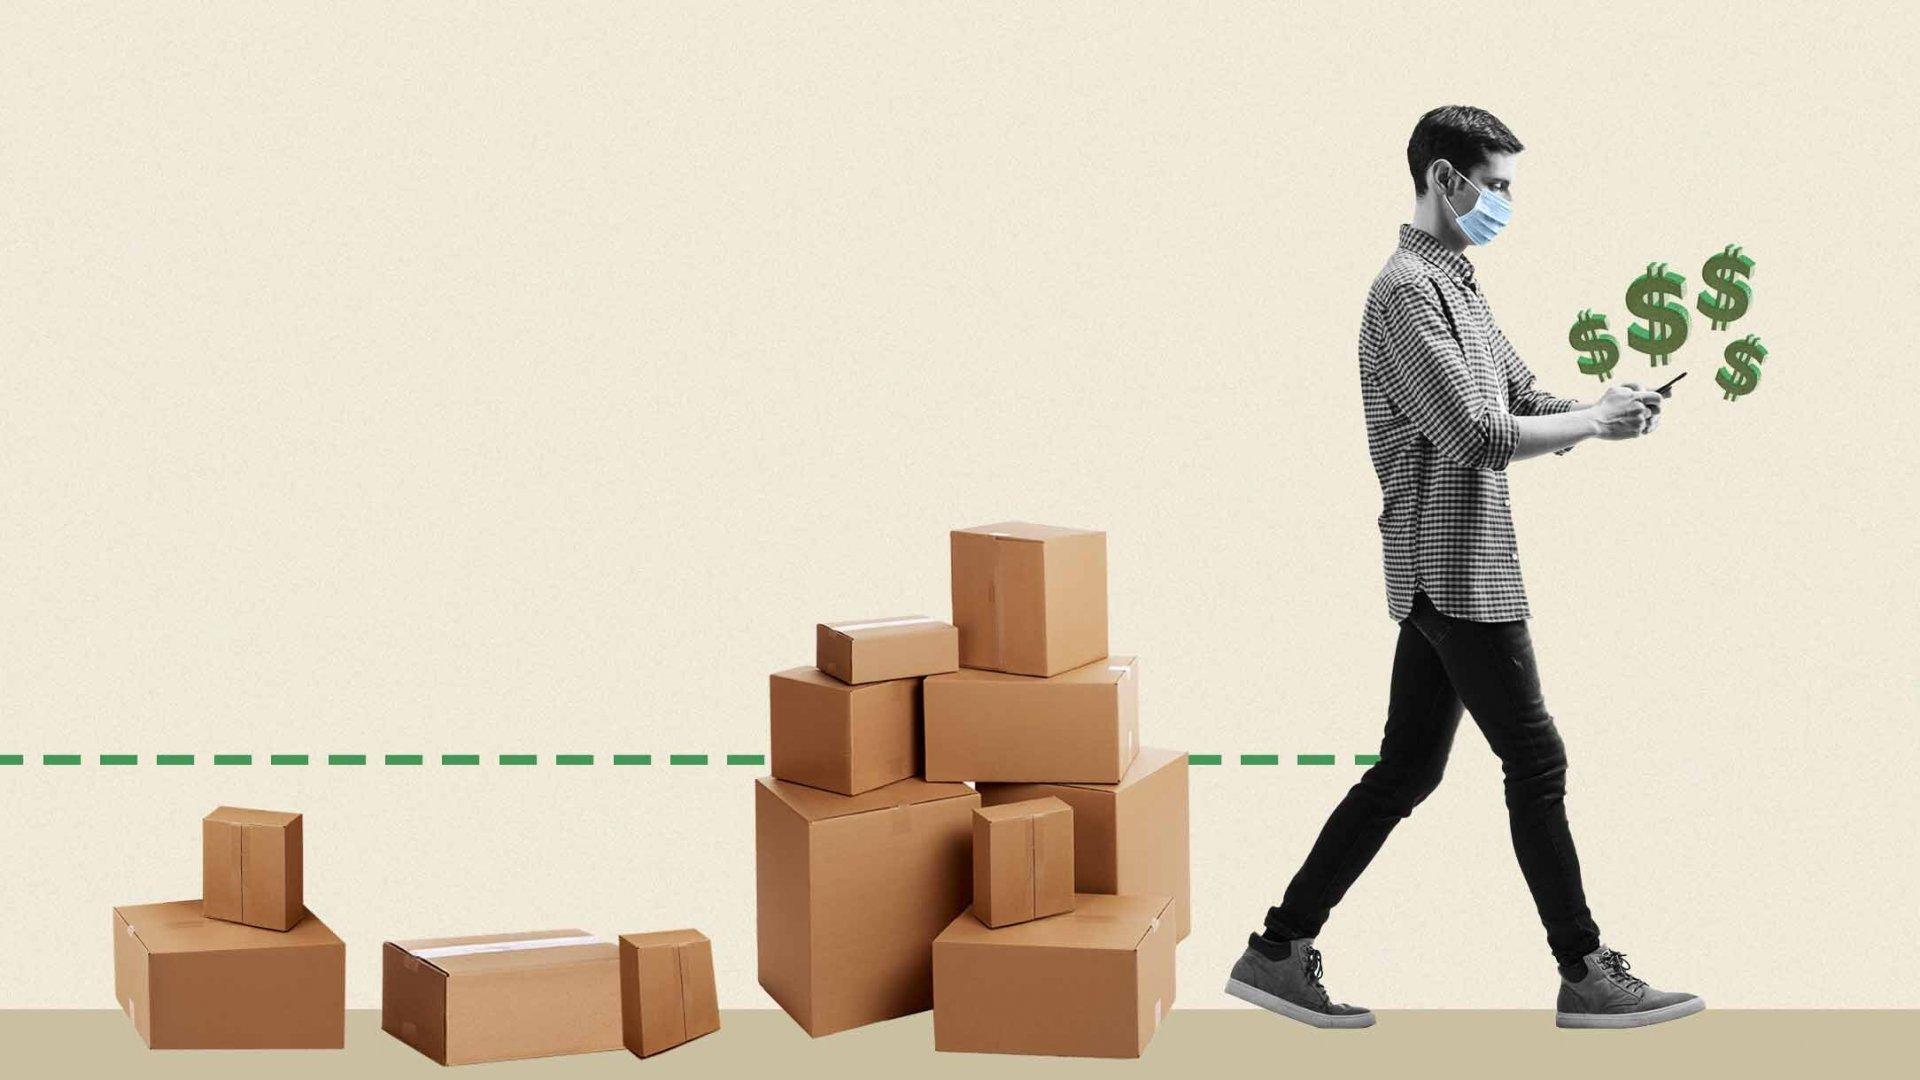 4 Ways Covid-19 Changed Online Consumer Behavior